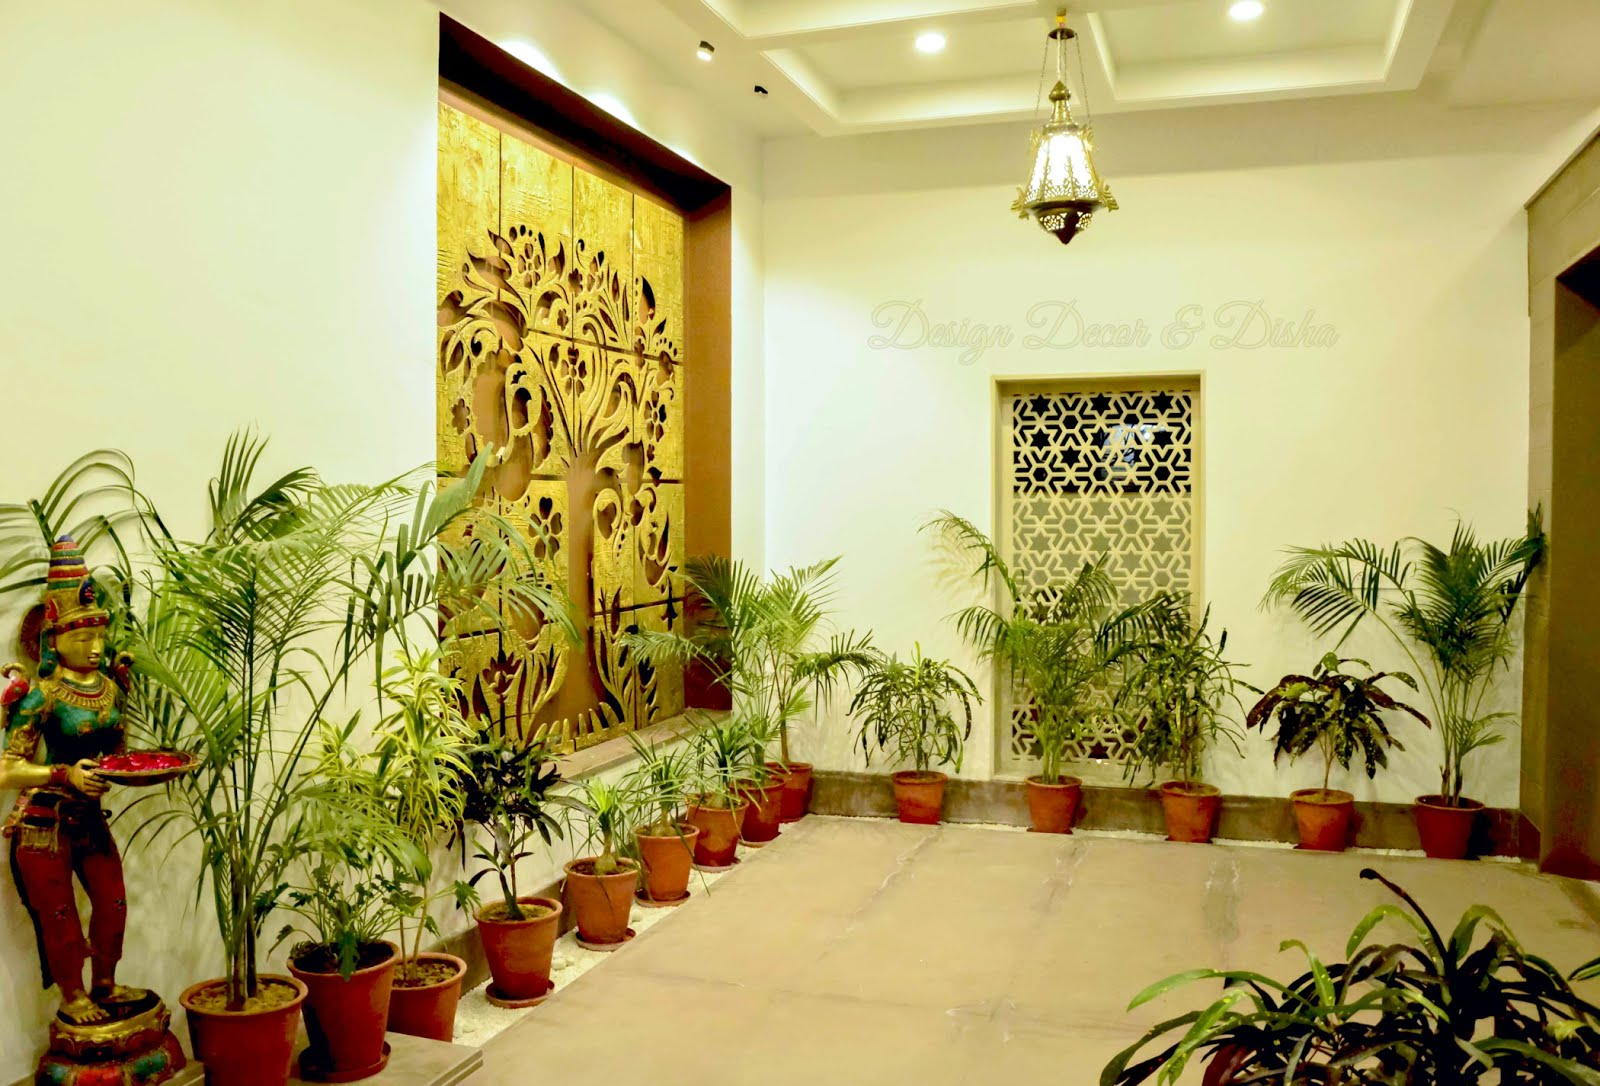 Design Decor Disha An Indian Design Decor Blog 2018